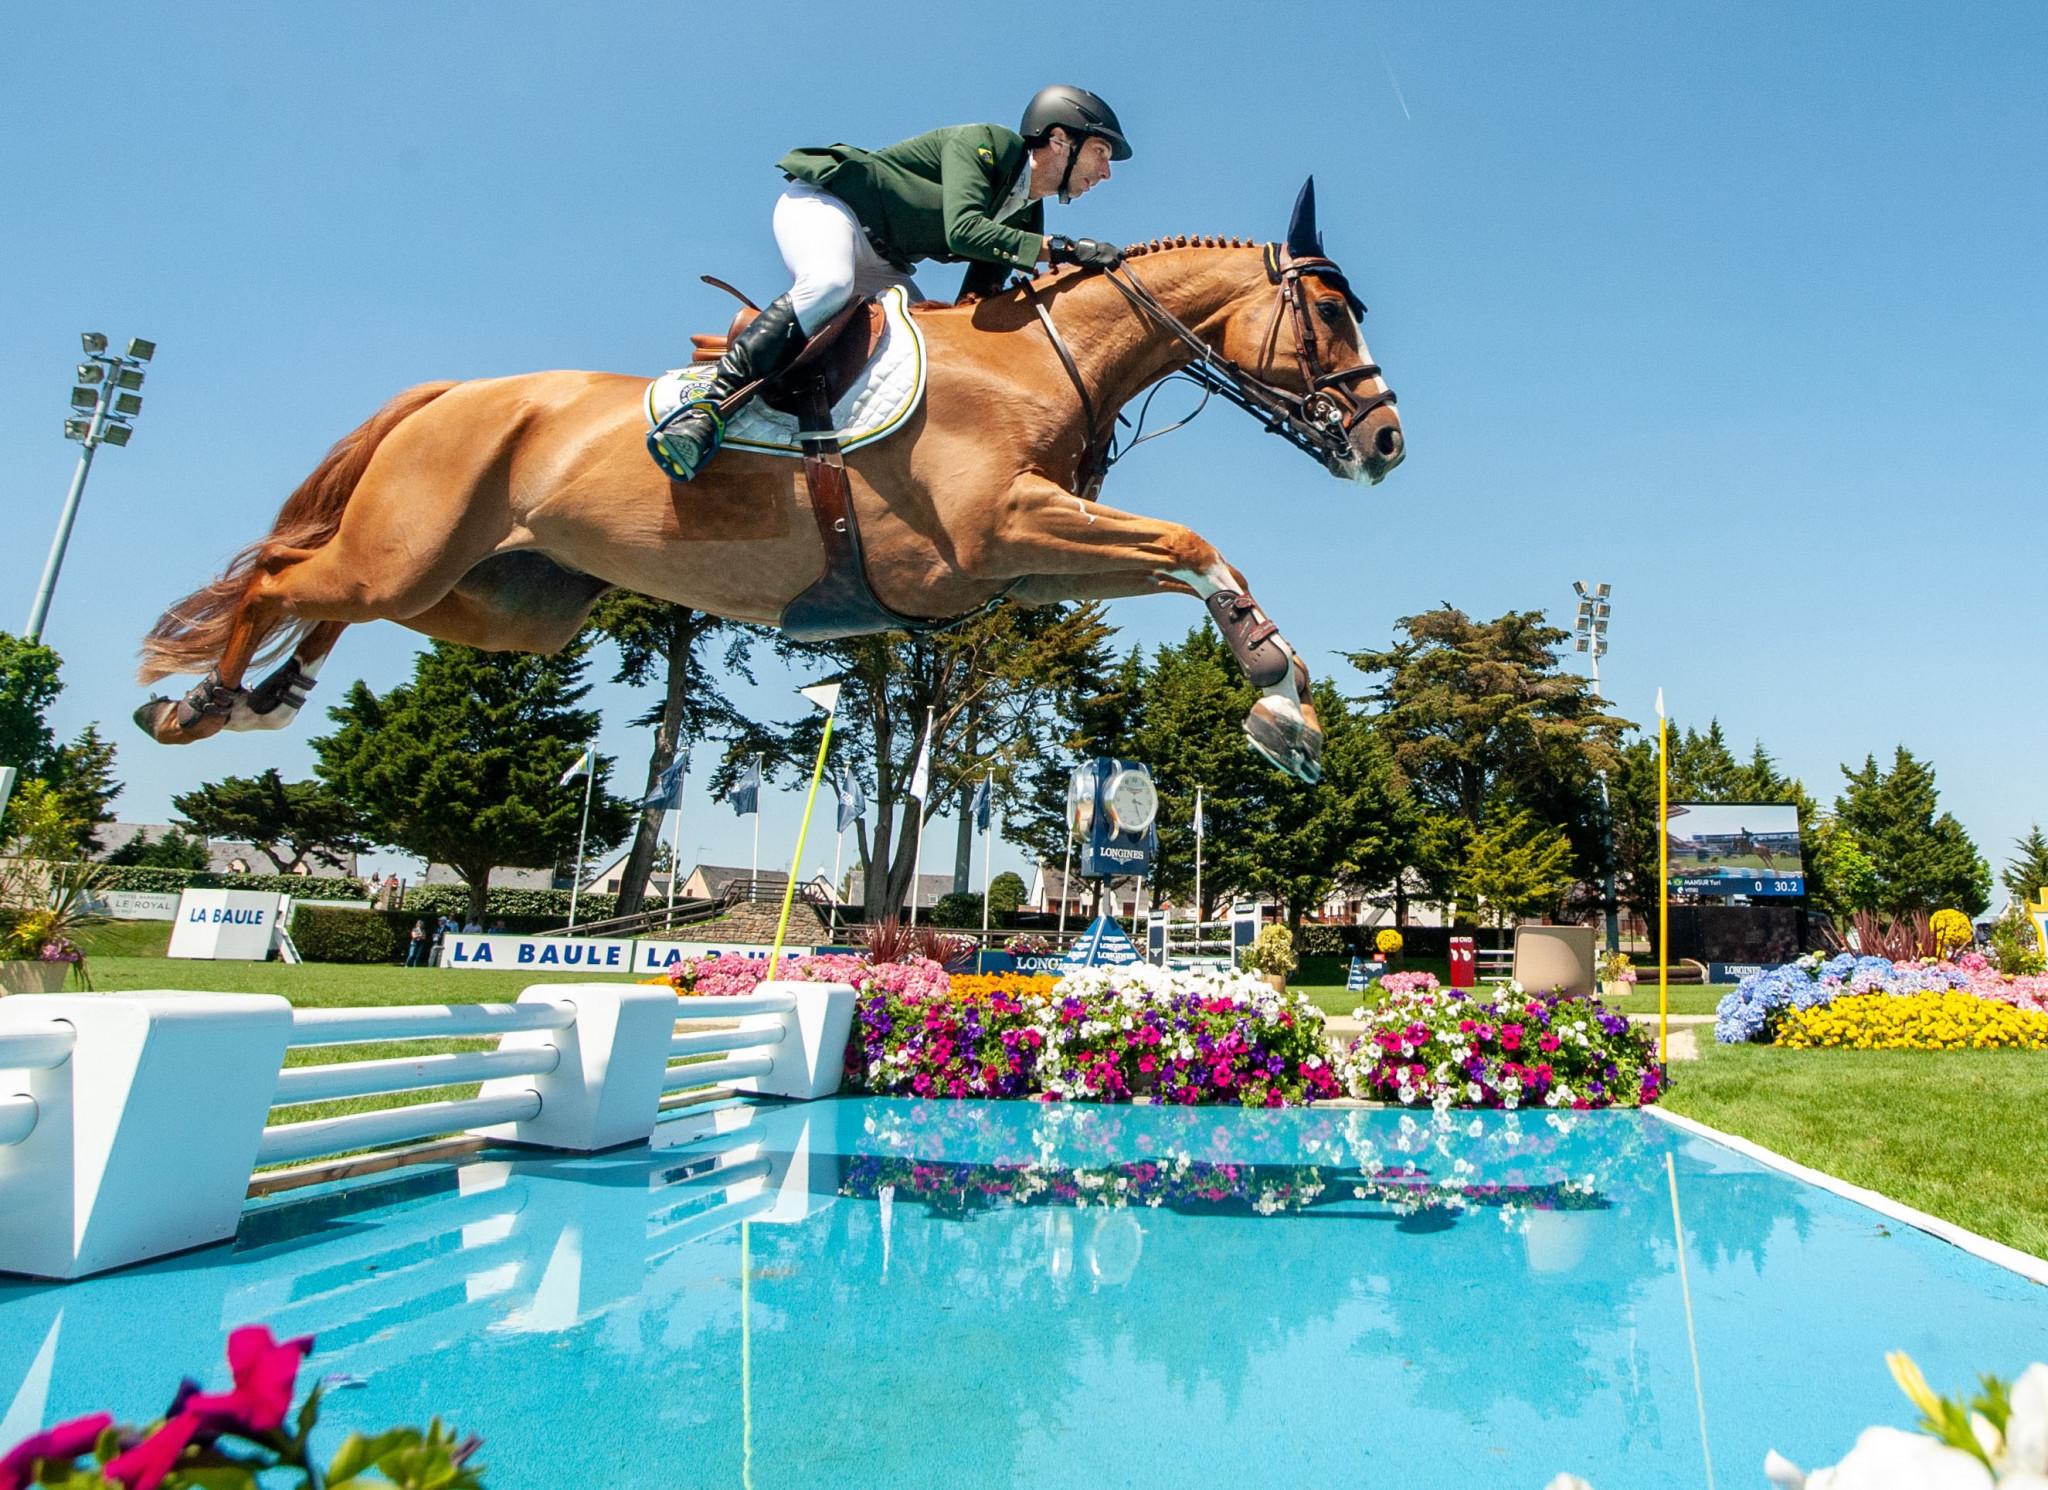 Brazil earn first FEI Nations Cup Jumping title in La Baule